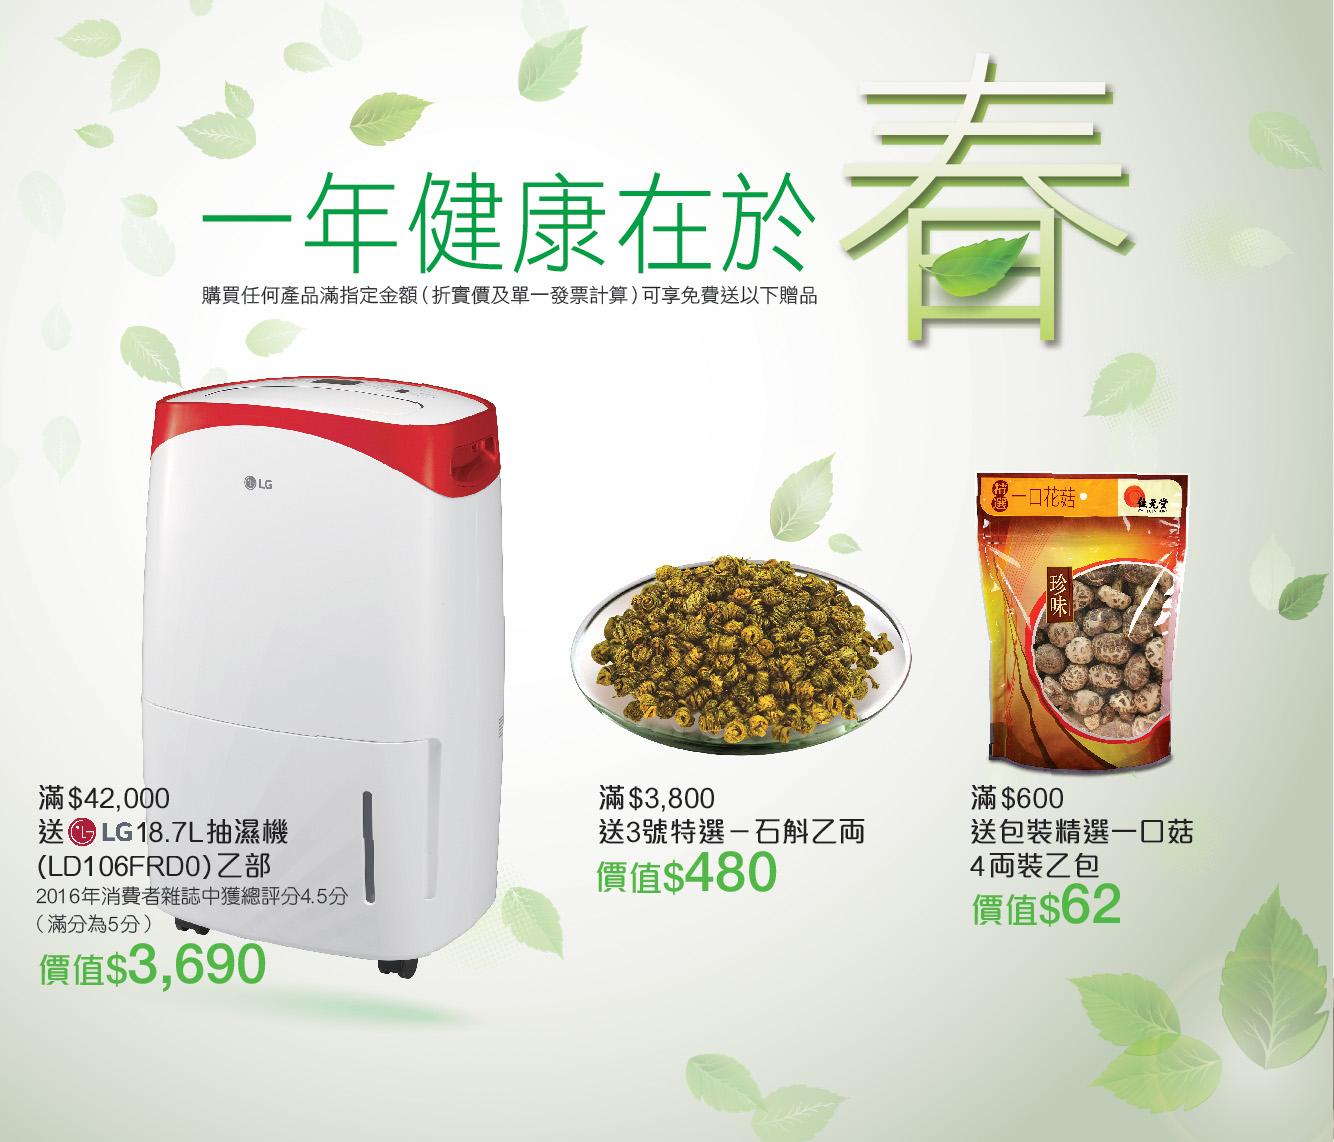 <!--:en-->Healthy Promotion in Spring 2017<!--:--><!--:cn-->一年健康在于「春」推广<!--:--><!--:hk-->一年健康在於「春」推廣<!--:-->